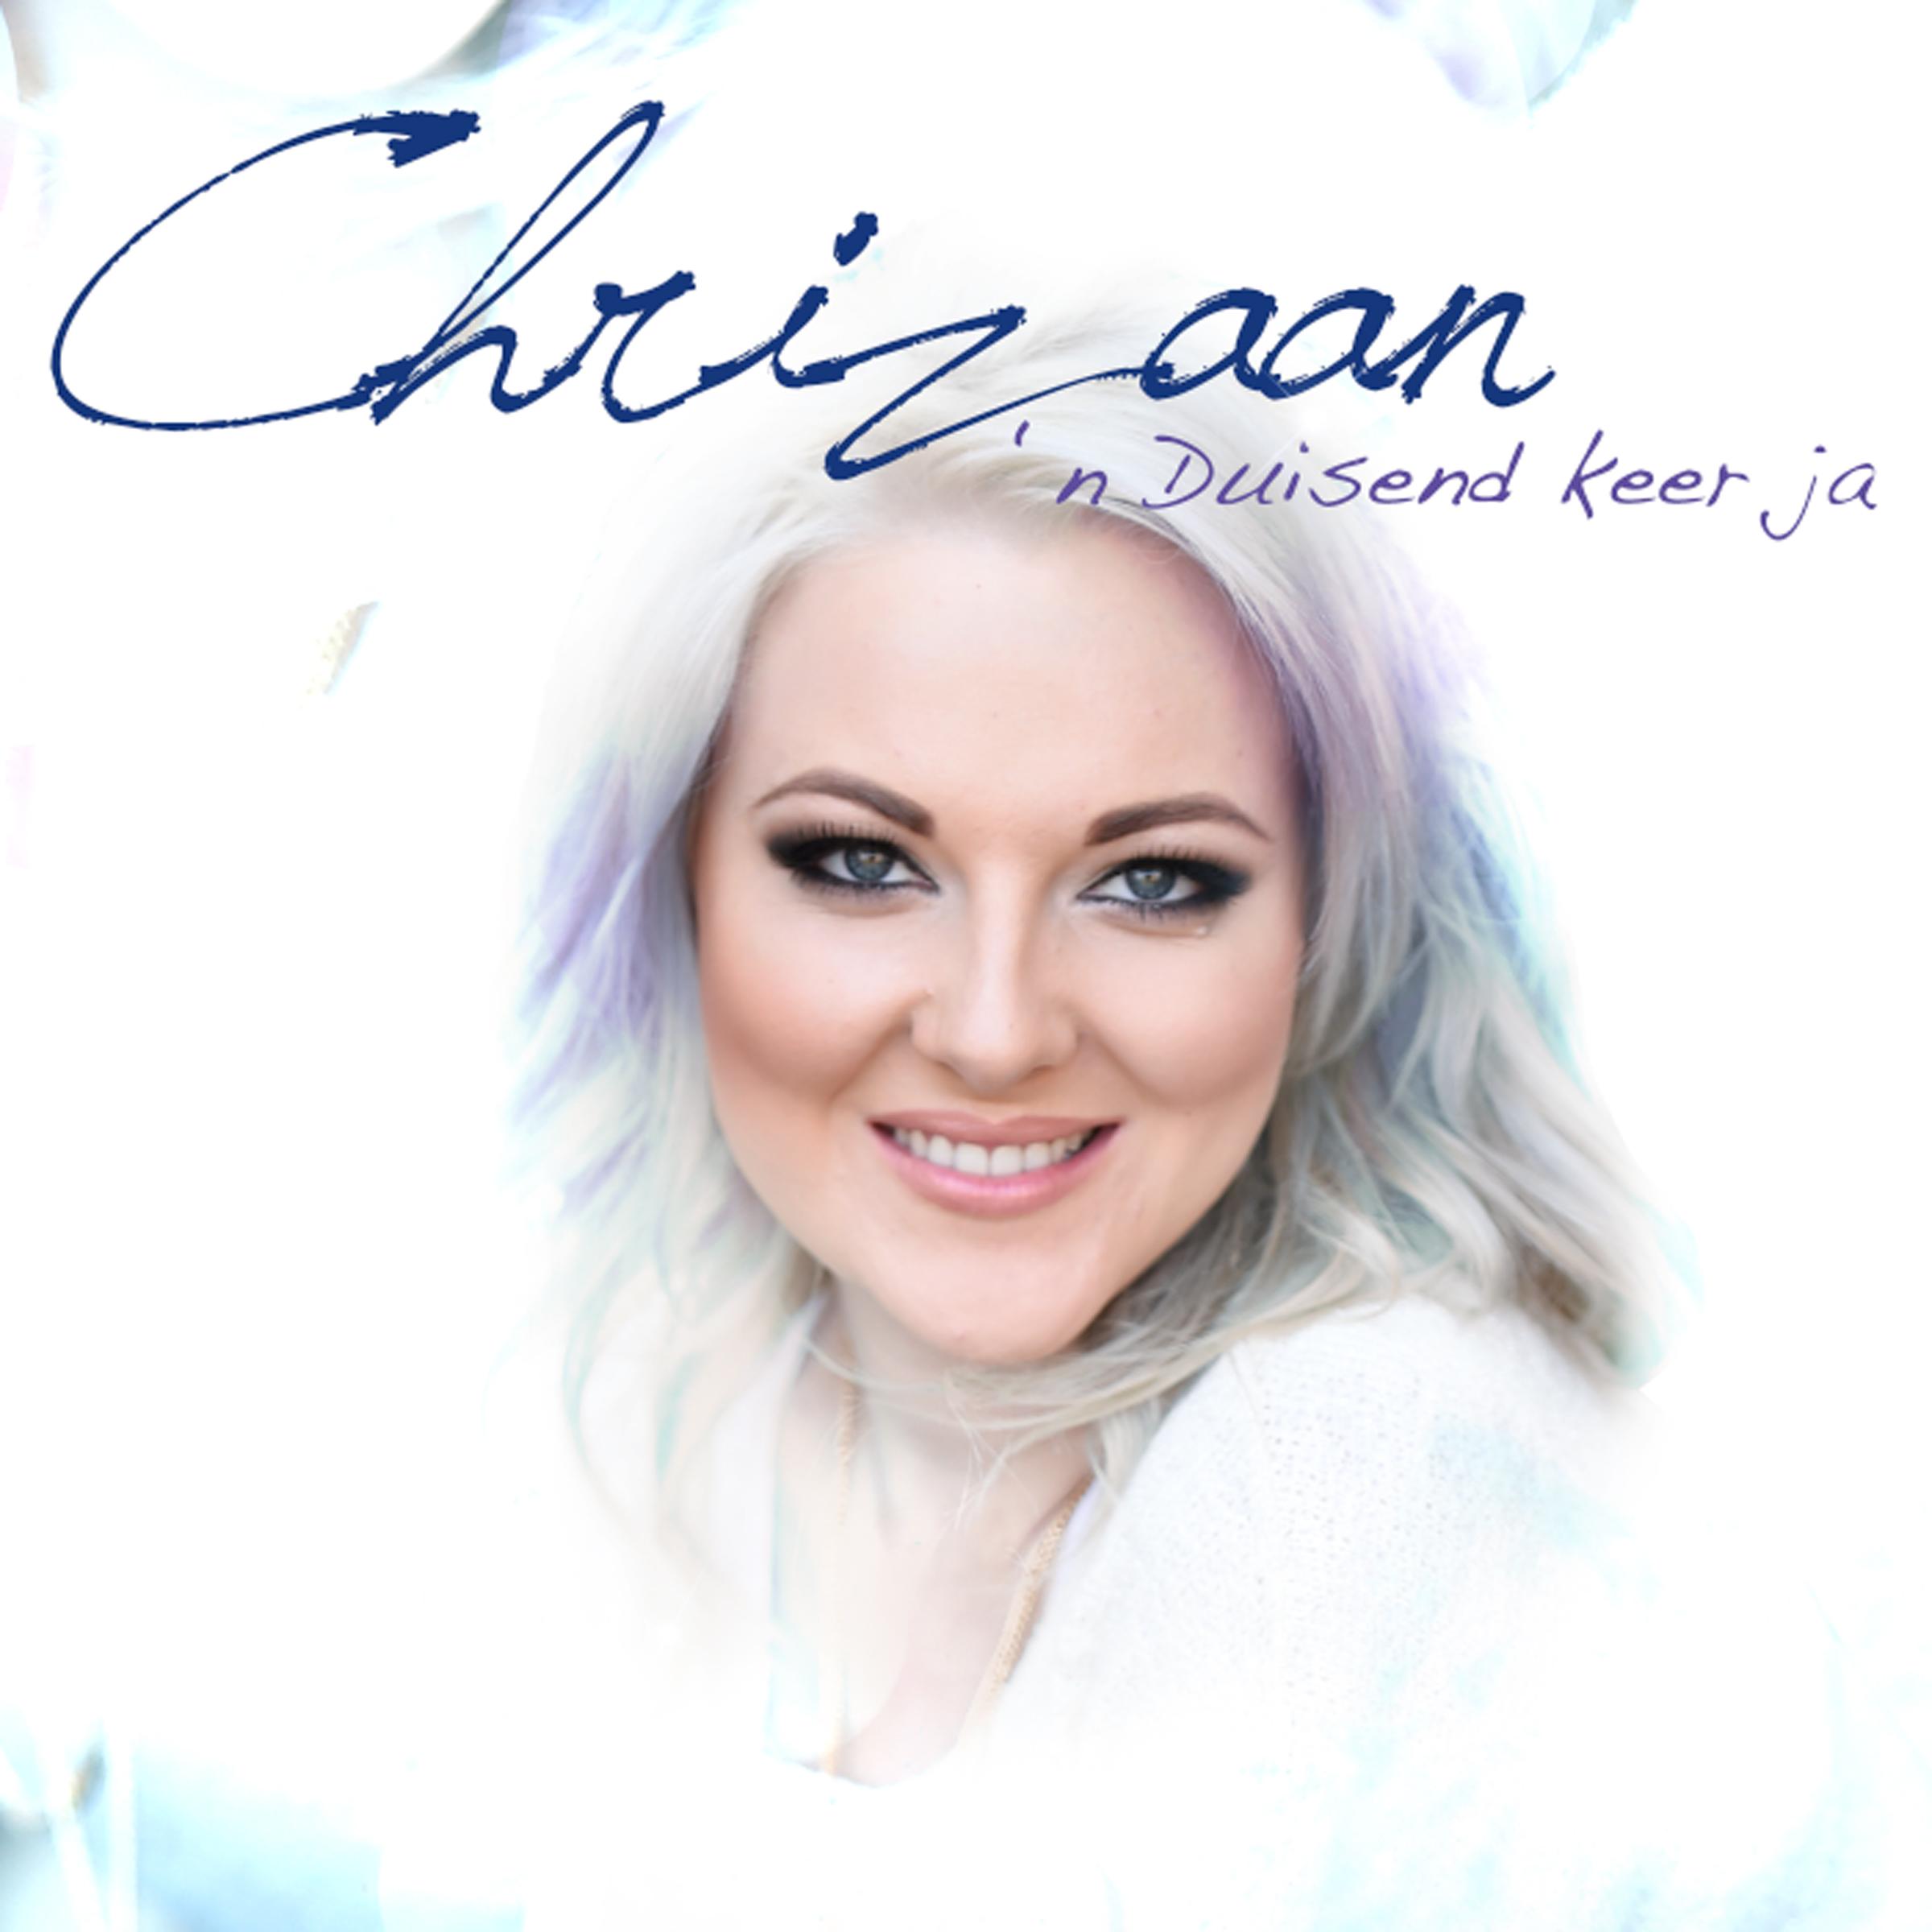 CHRIZAAN